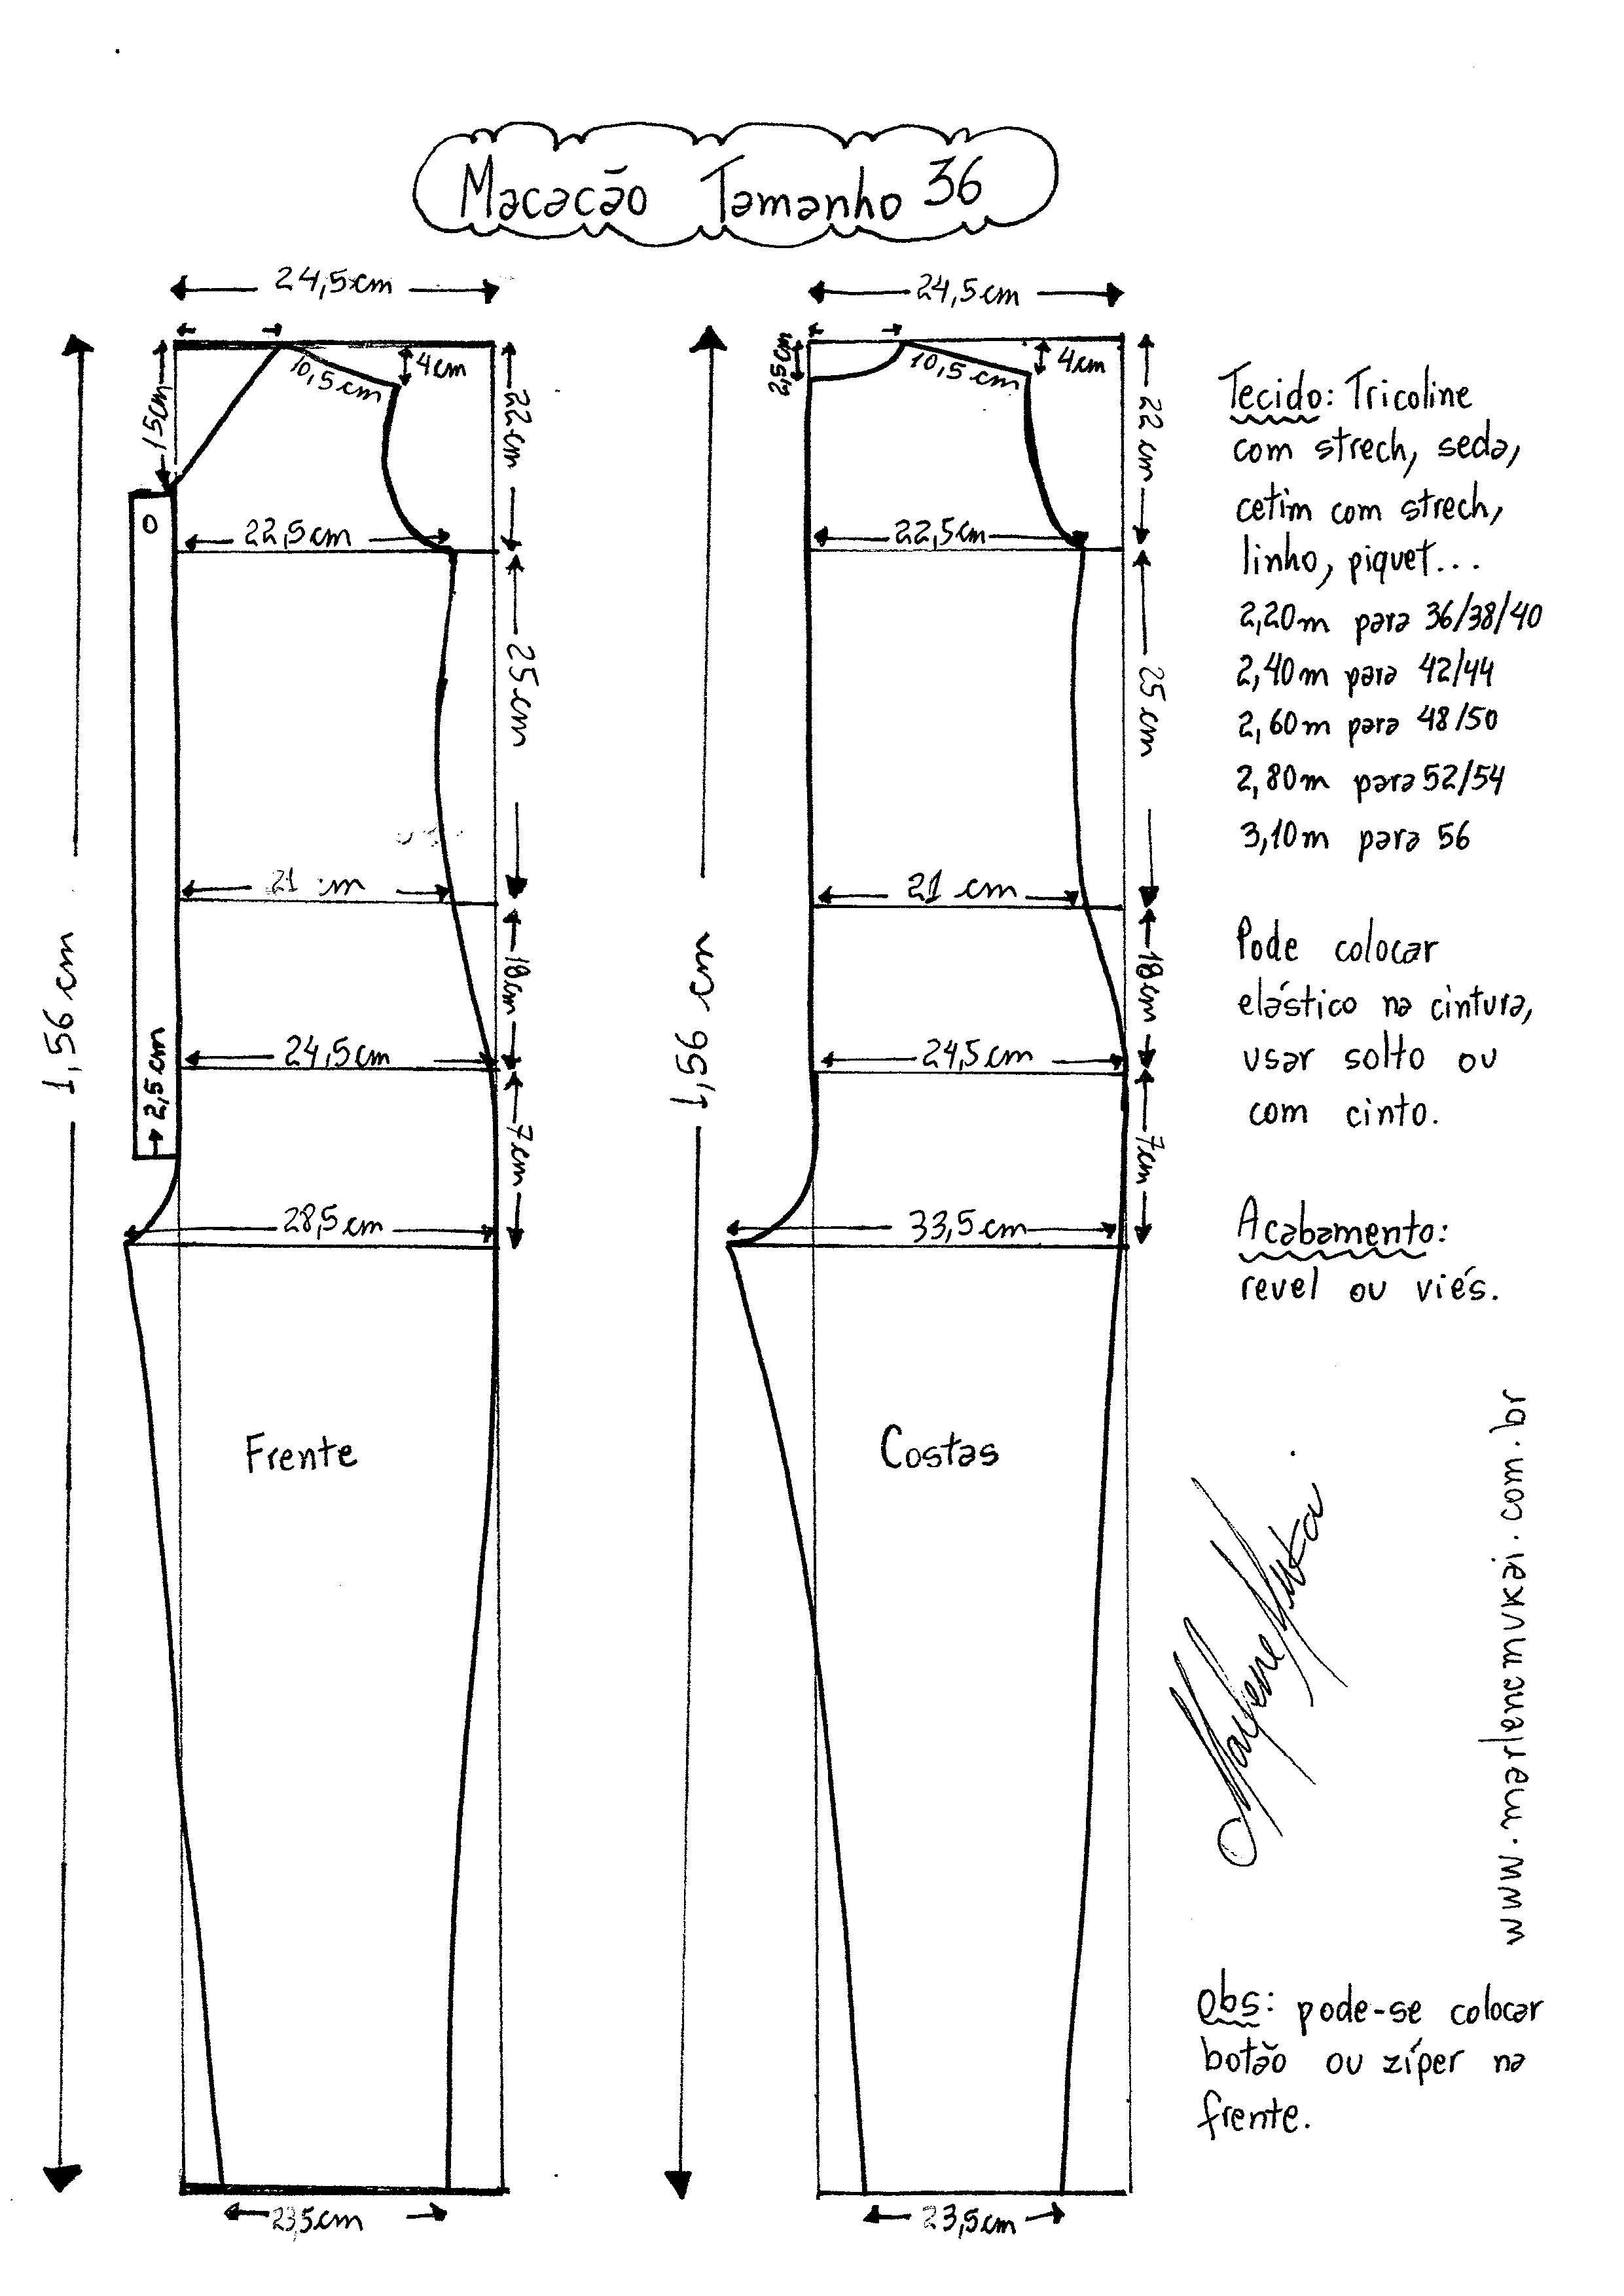 Pin by สุนทรี ตระกูลสิงขร on แหวนเพชร | Pinterest | Sewing, Pattern ...